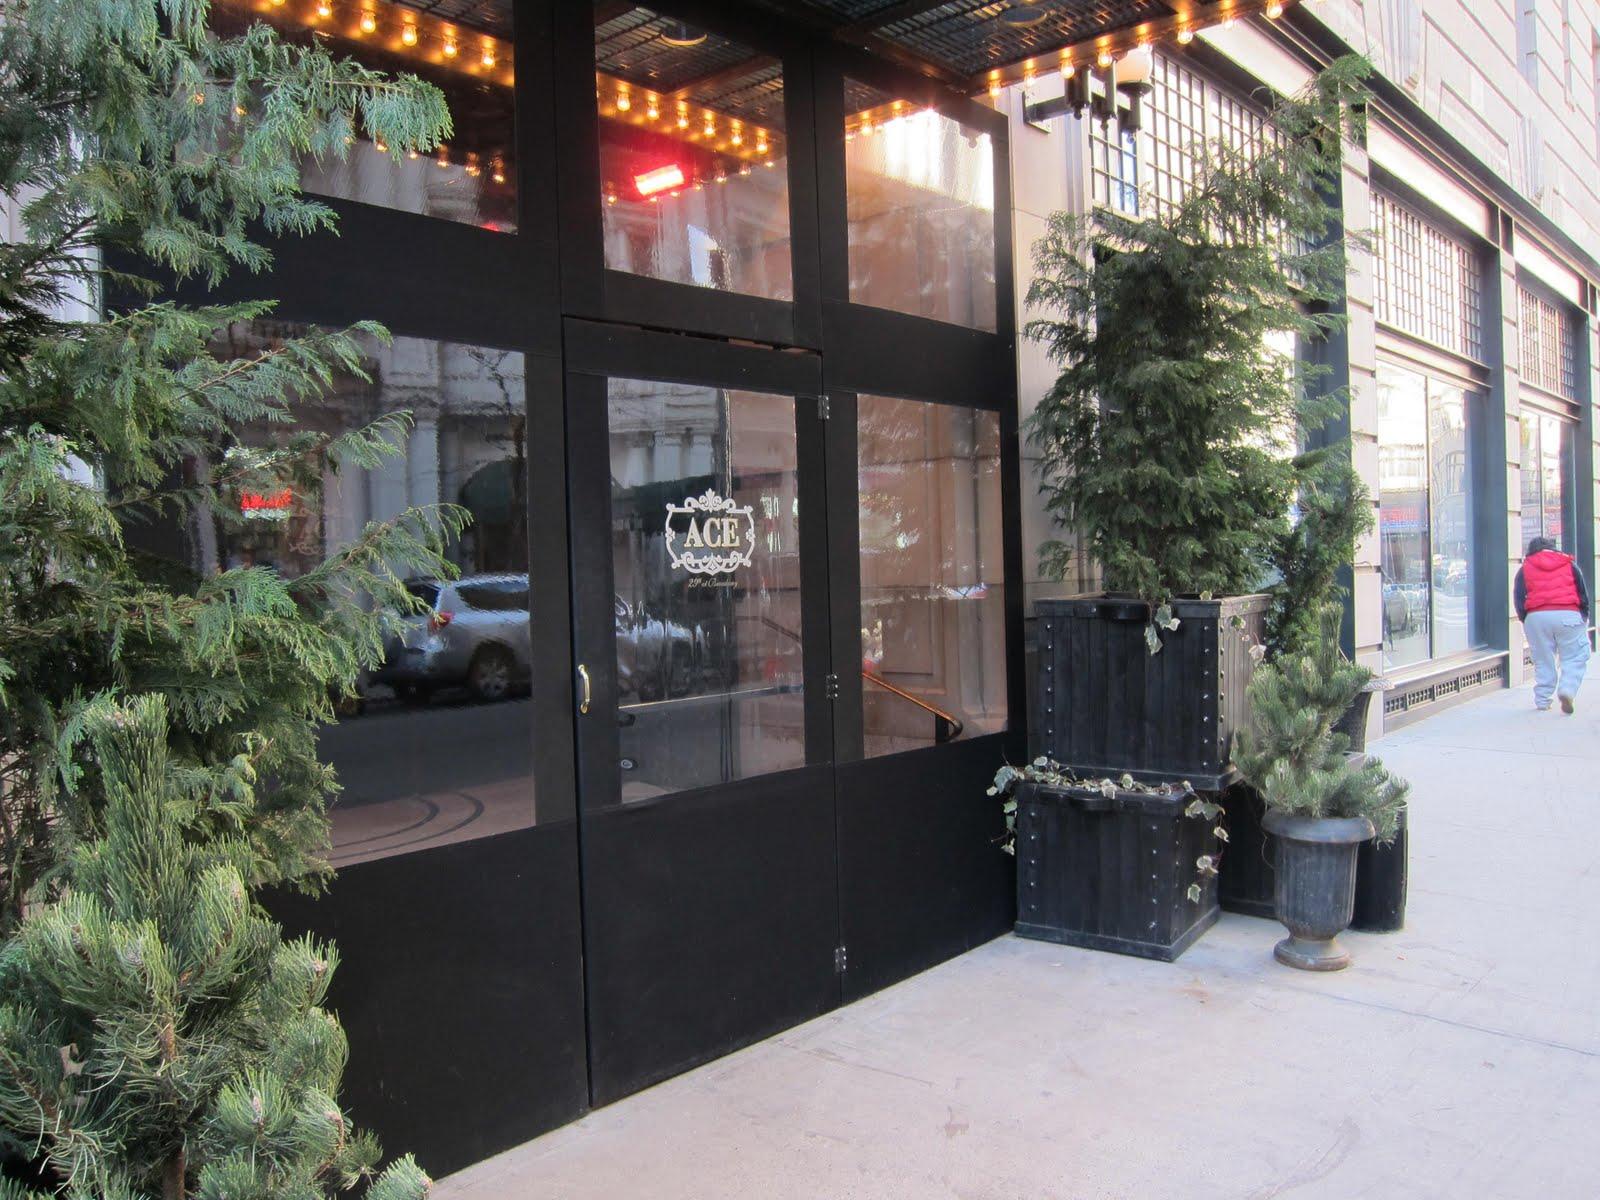 If One Were To Attempt Explain The Boutique ACE Hotel A Friend Descriptors Would Undoubtedly Include Brash Hipster Unique